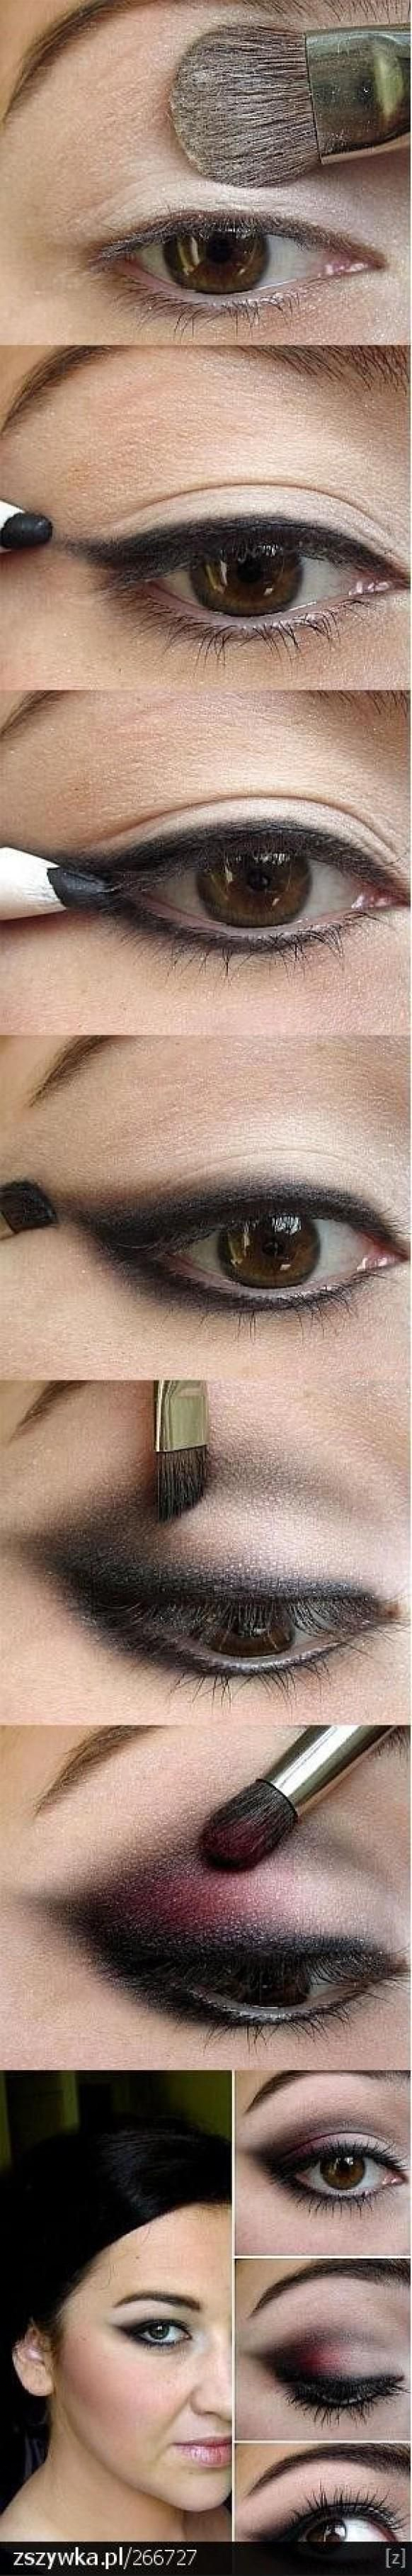 www.weddbook.com everything about wedding ♥ Beautiful wedding eye makeup tutorial #weddbook #wedding #makeup